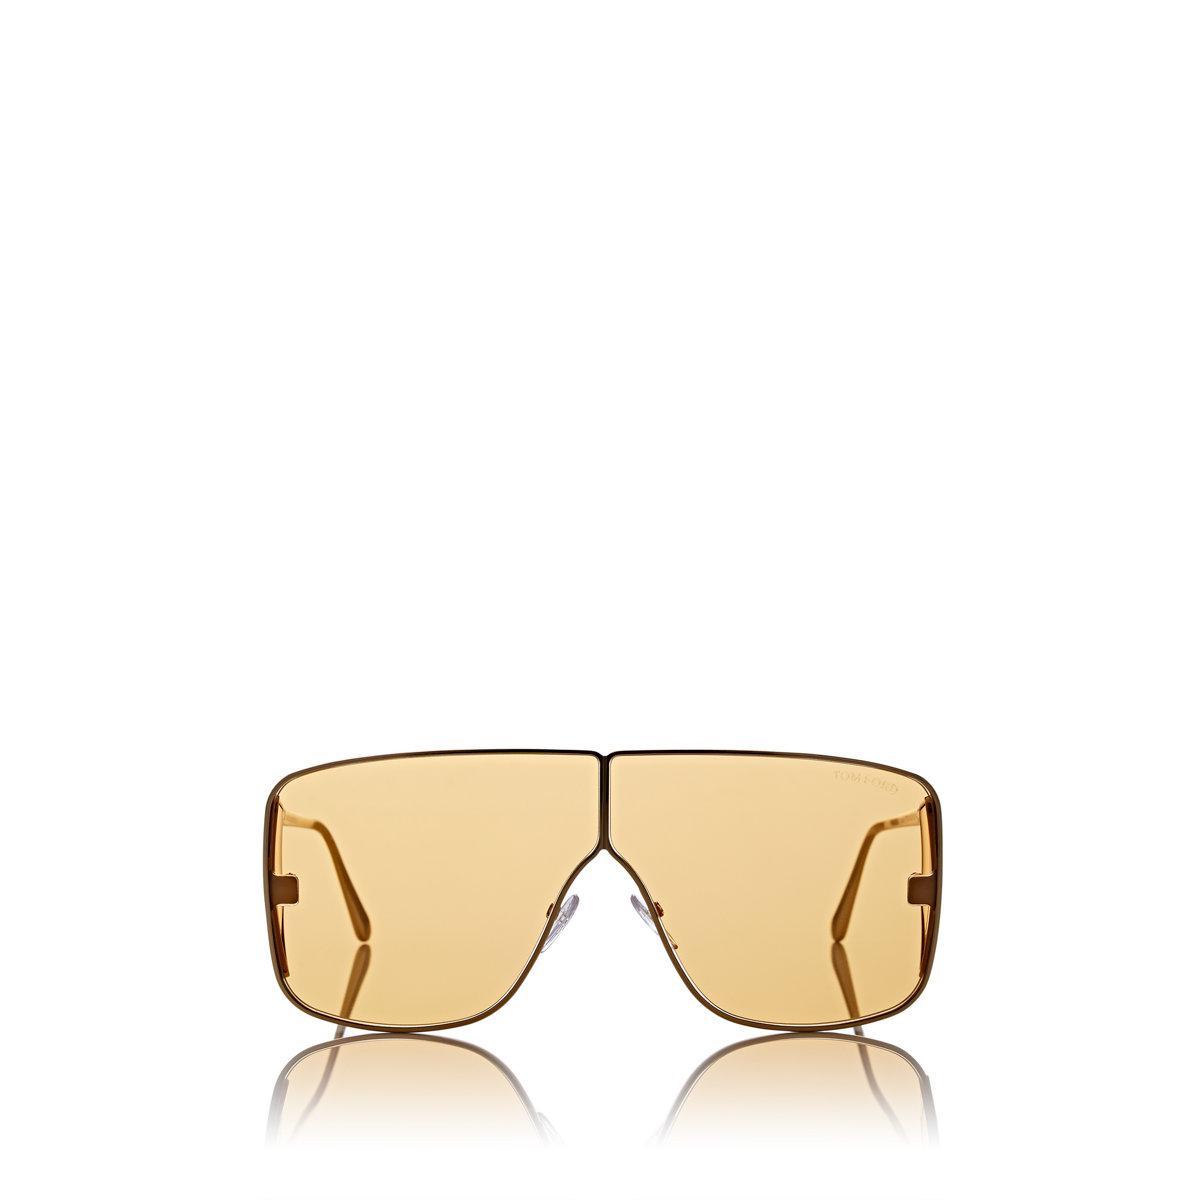 5f034f7bef39 Tom Ford. Men s Metallic Spector Sunglasses. £404 From Barneys New York ...